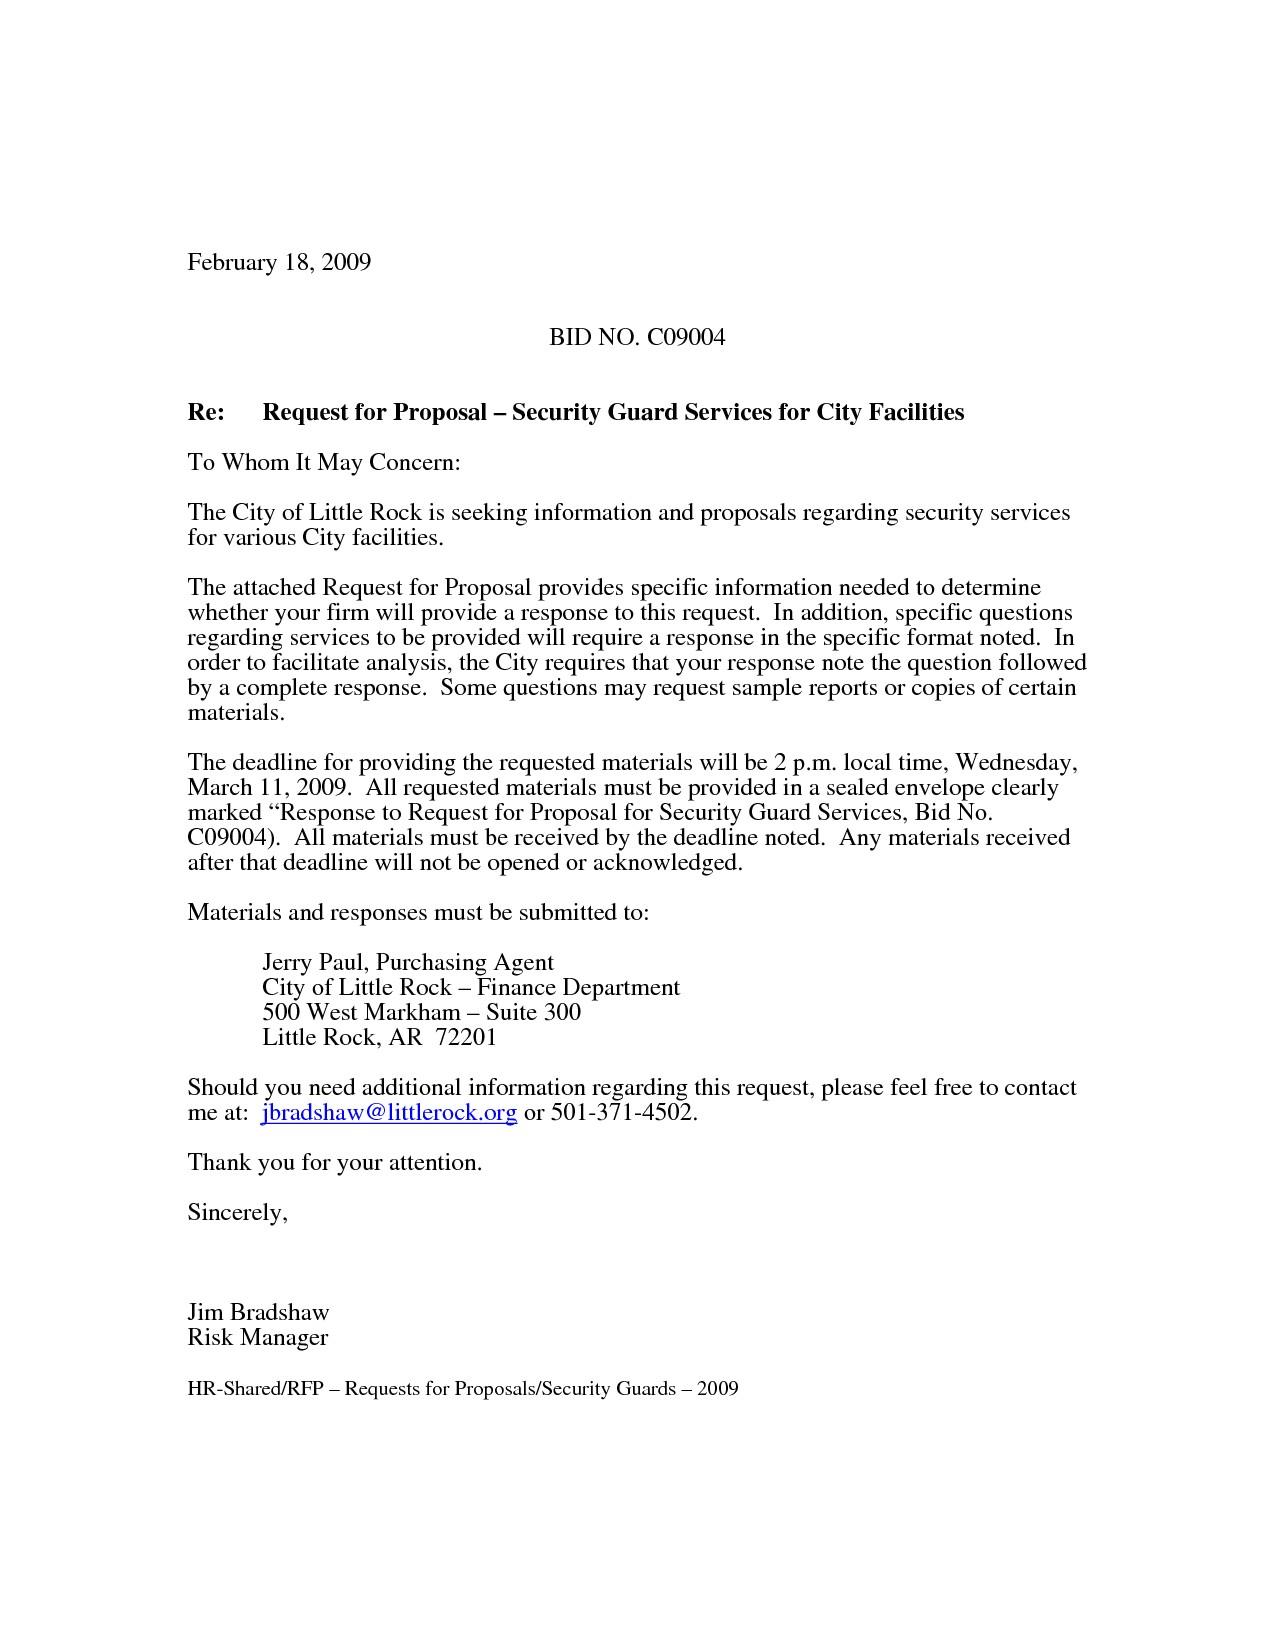 Security Guard Proposal Template Security Guard Contract Template Joy Studio Design